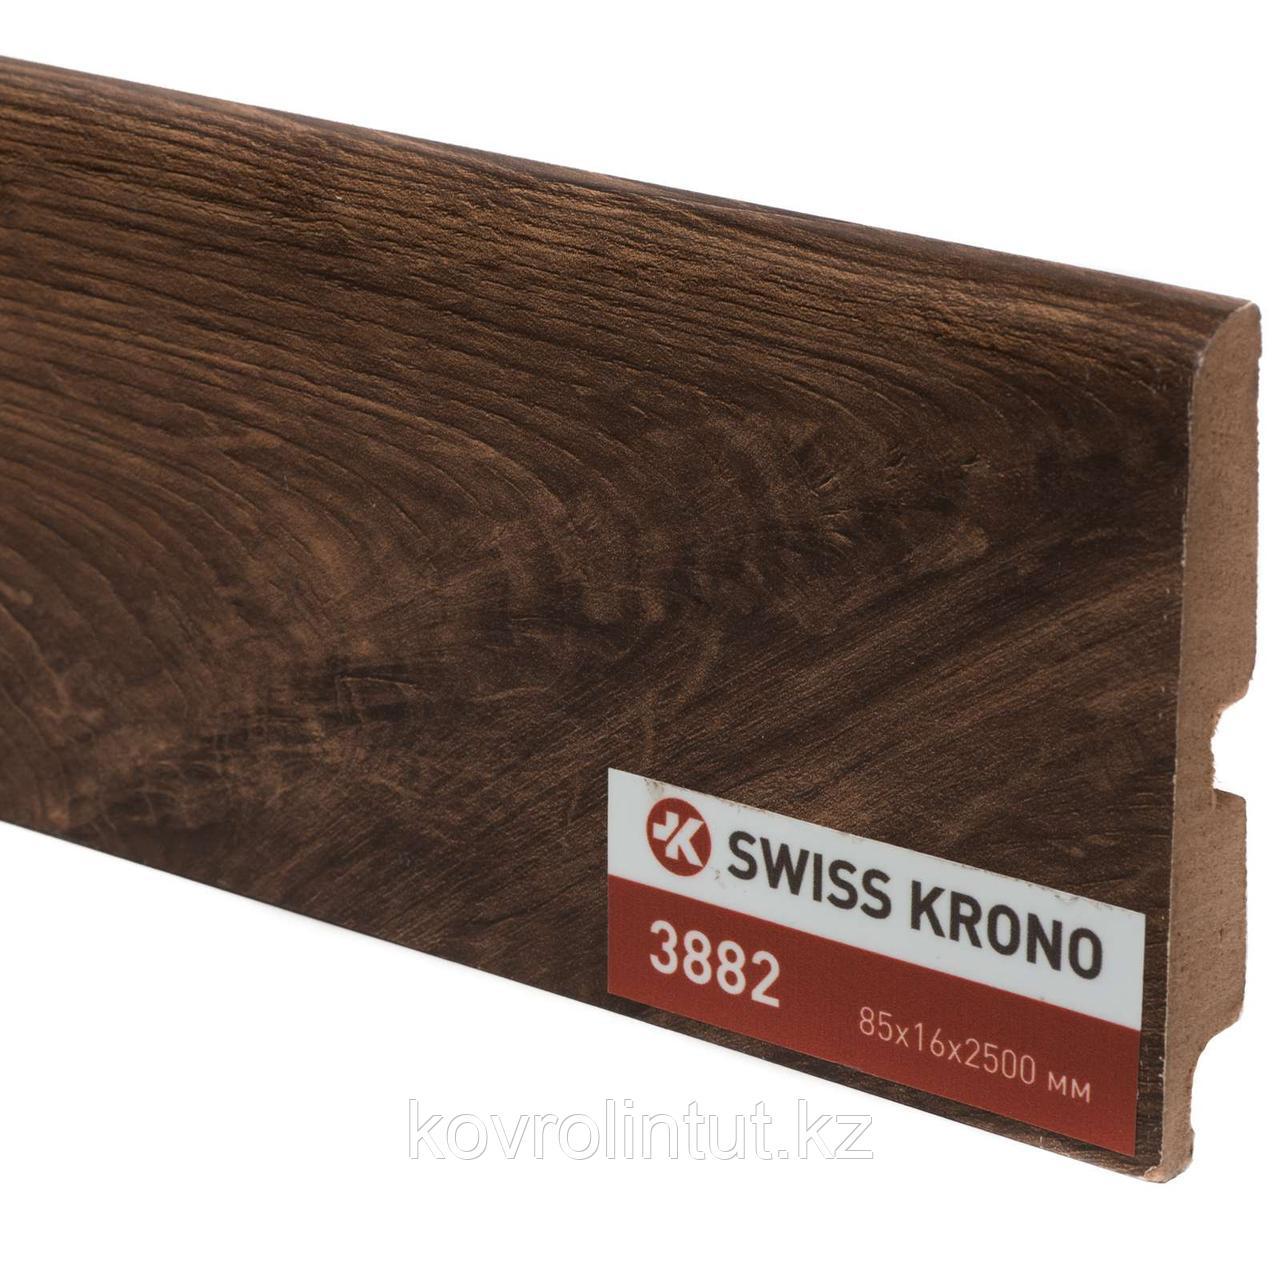 Плинтус Kronopol P85 3882 Barley Walnut 2500х85х16мм